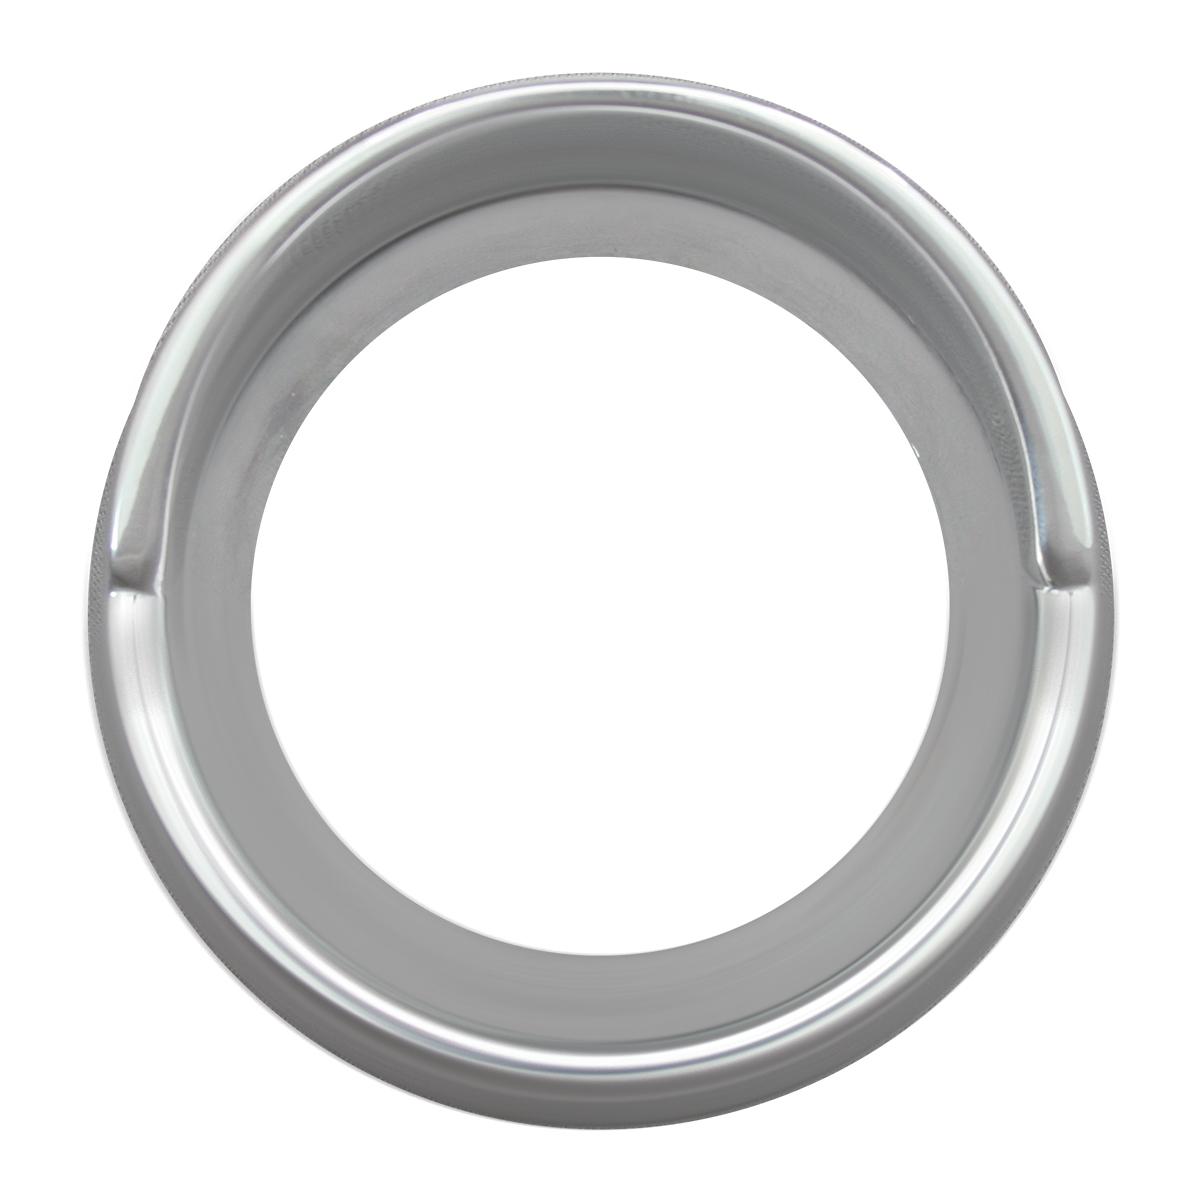 68390 Chrome Plastic Small Snap-On Gauge Cover w/ Visor for KW